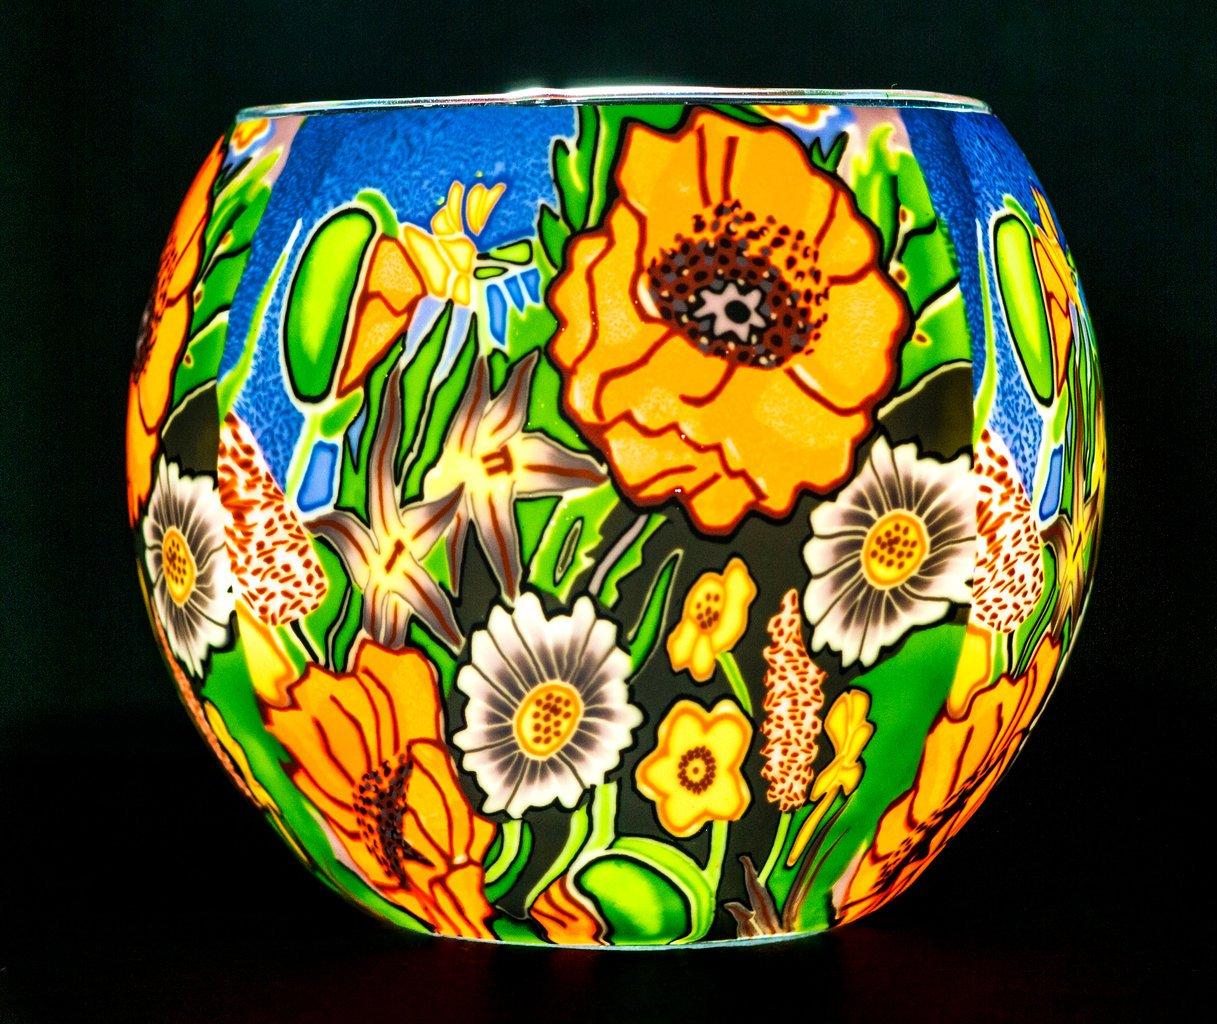 Benaya Glass Nightlight Tealight Holder - Poppy Garden Milford Collection